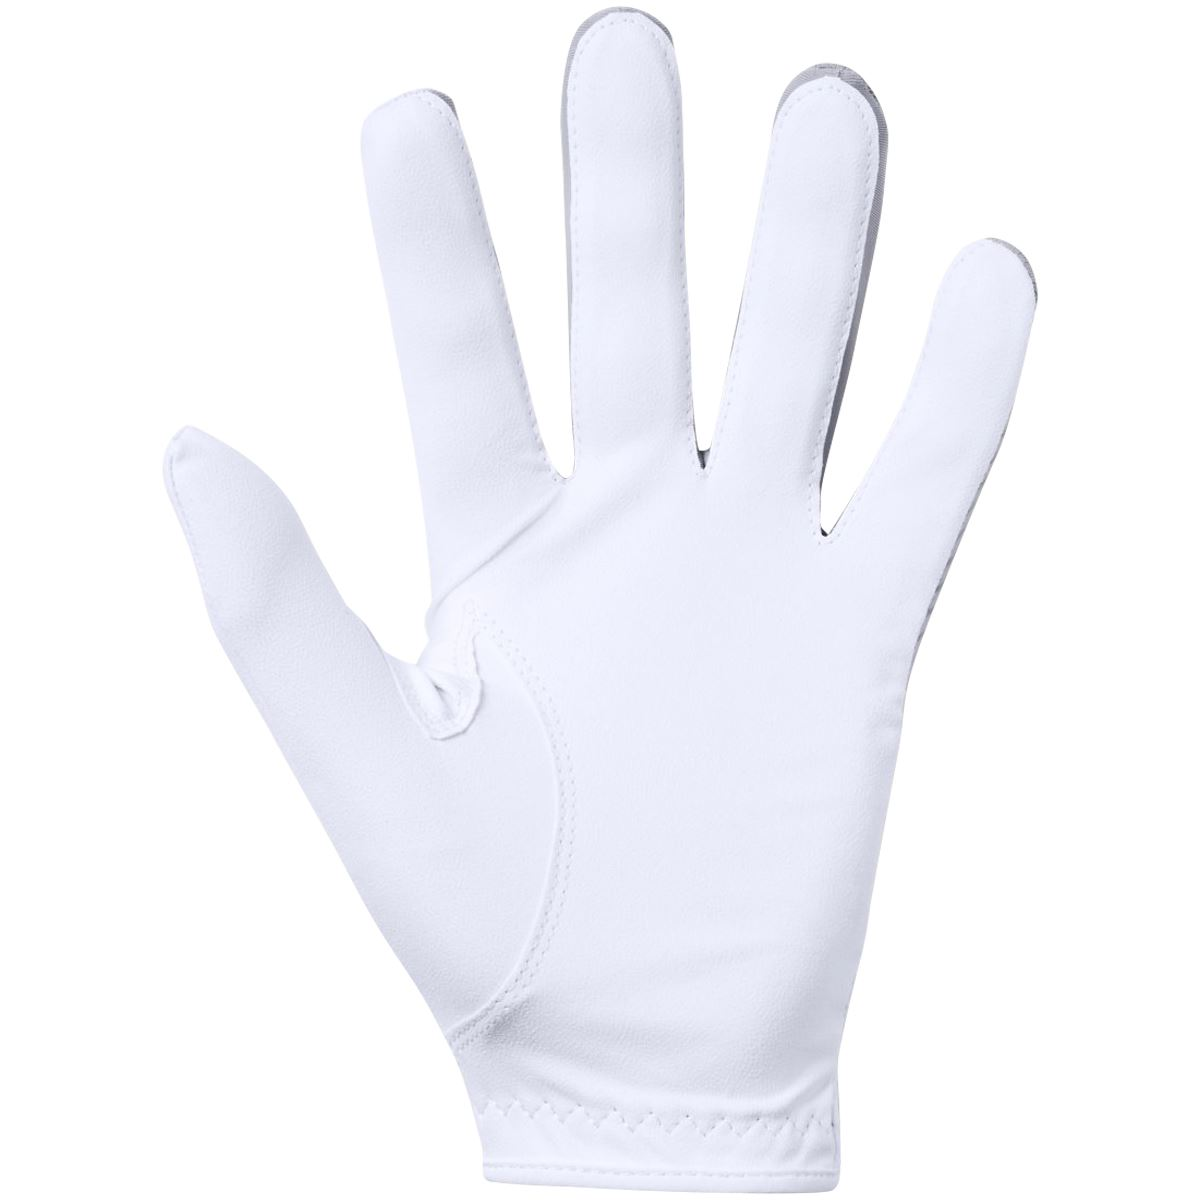 Under-Armour-Golf-Glove-NEW-2019-UA-Medal-Synthetic-Textured-Mens-Left-Hand Indexbild 5